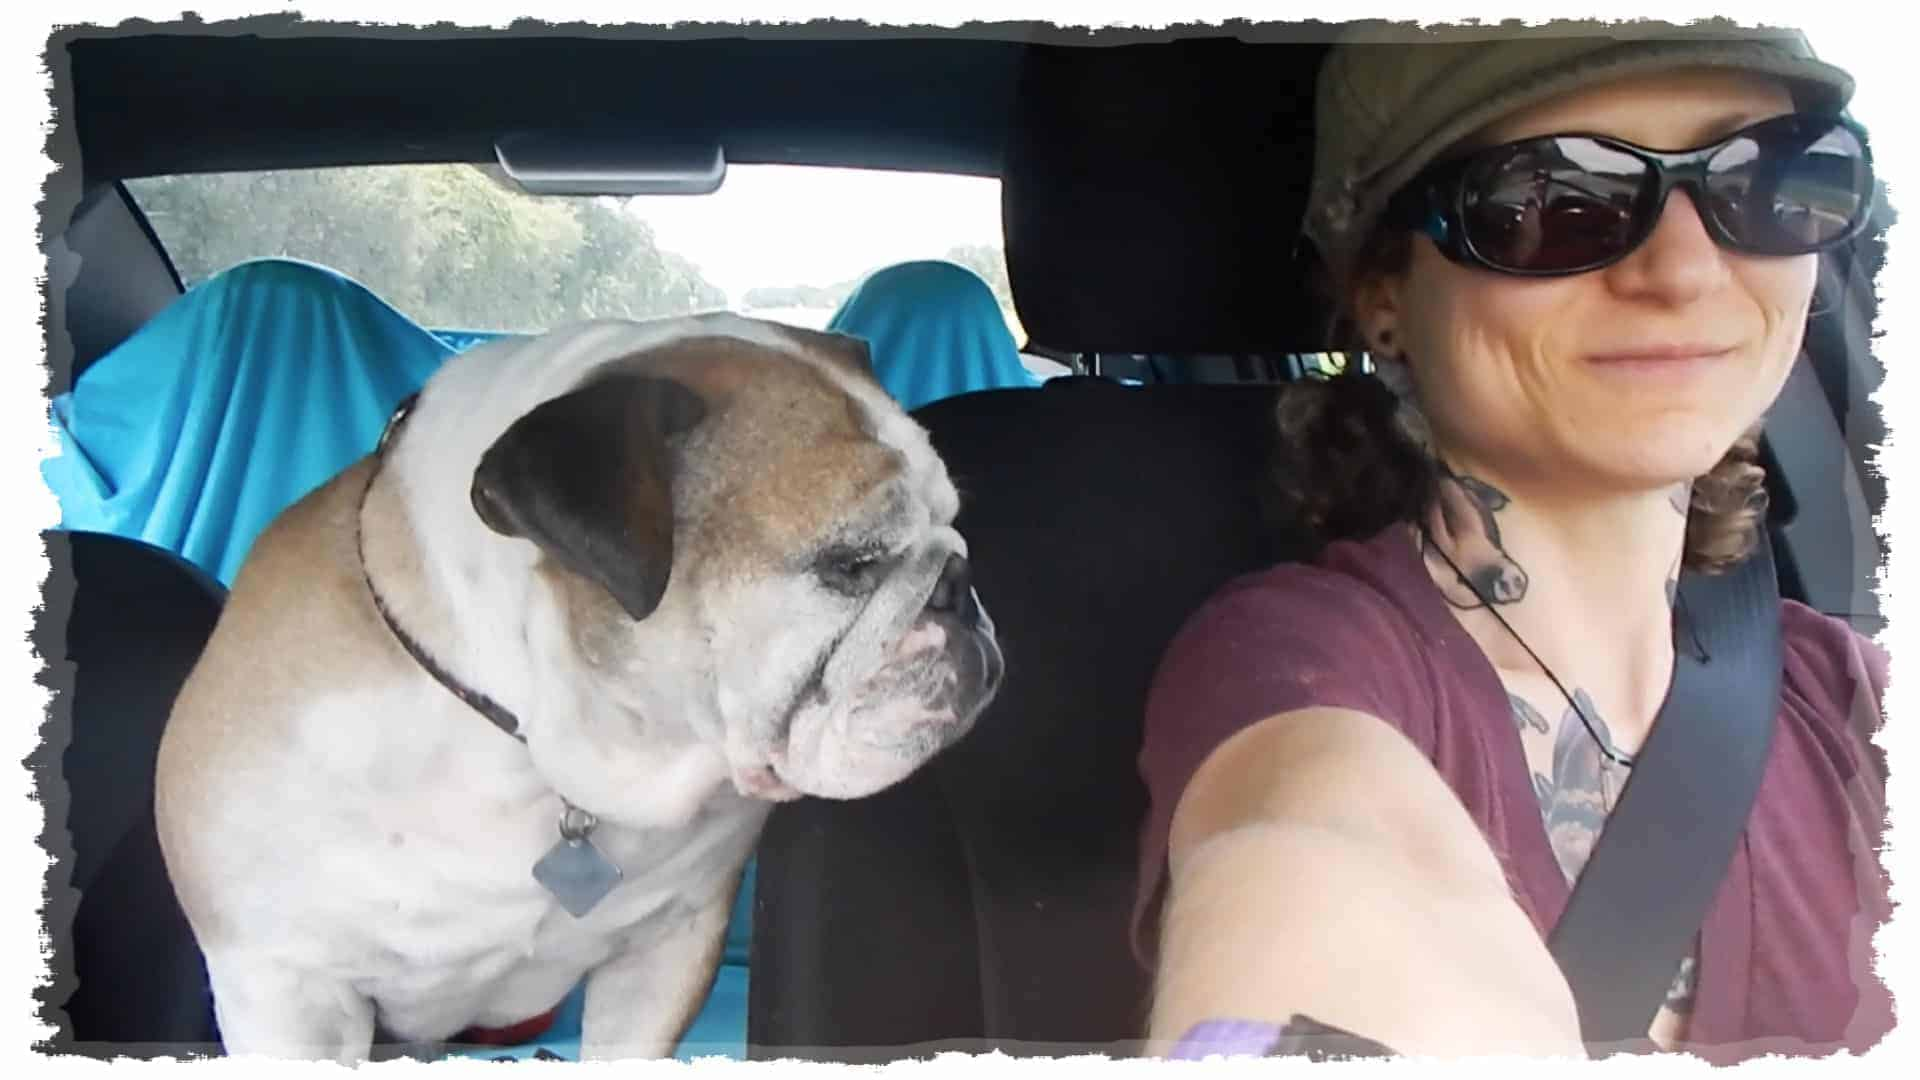 Emily Moran Barwick of Bite Size Vegan is shown behind a steering wheel, her beloved bulldog, Ooby sitting along side her.